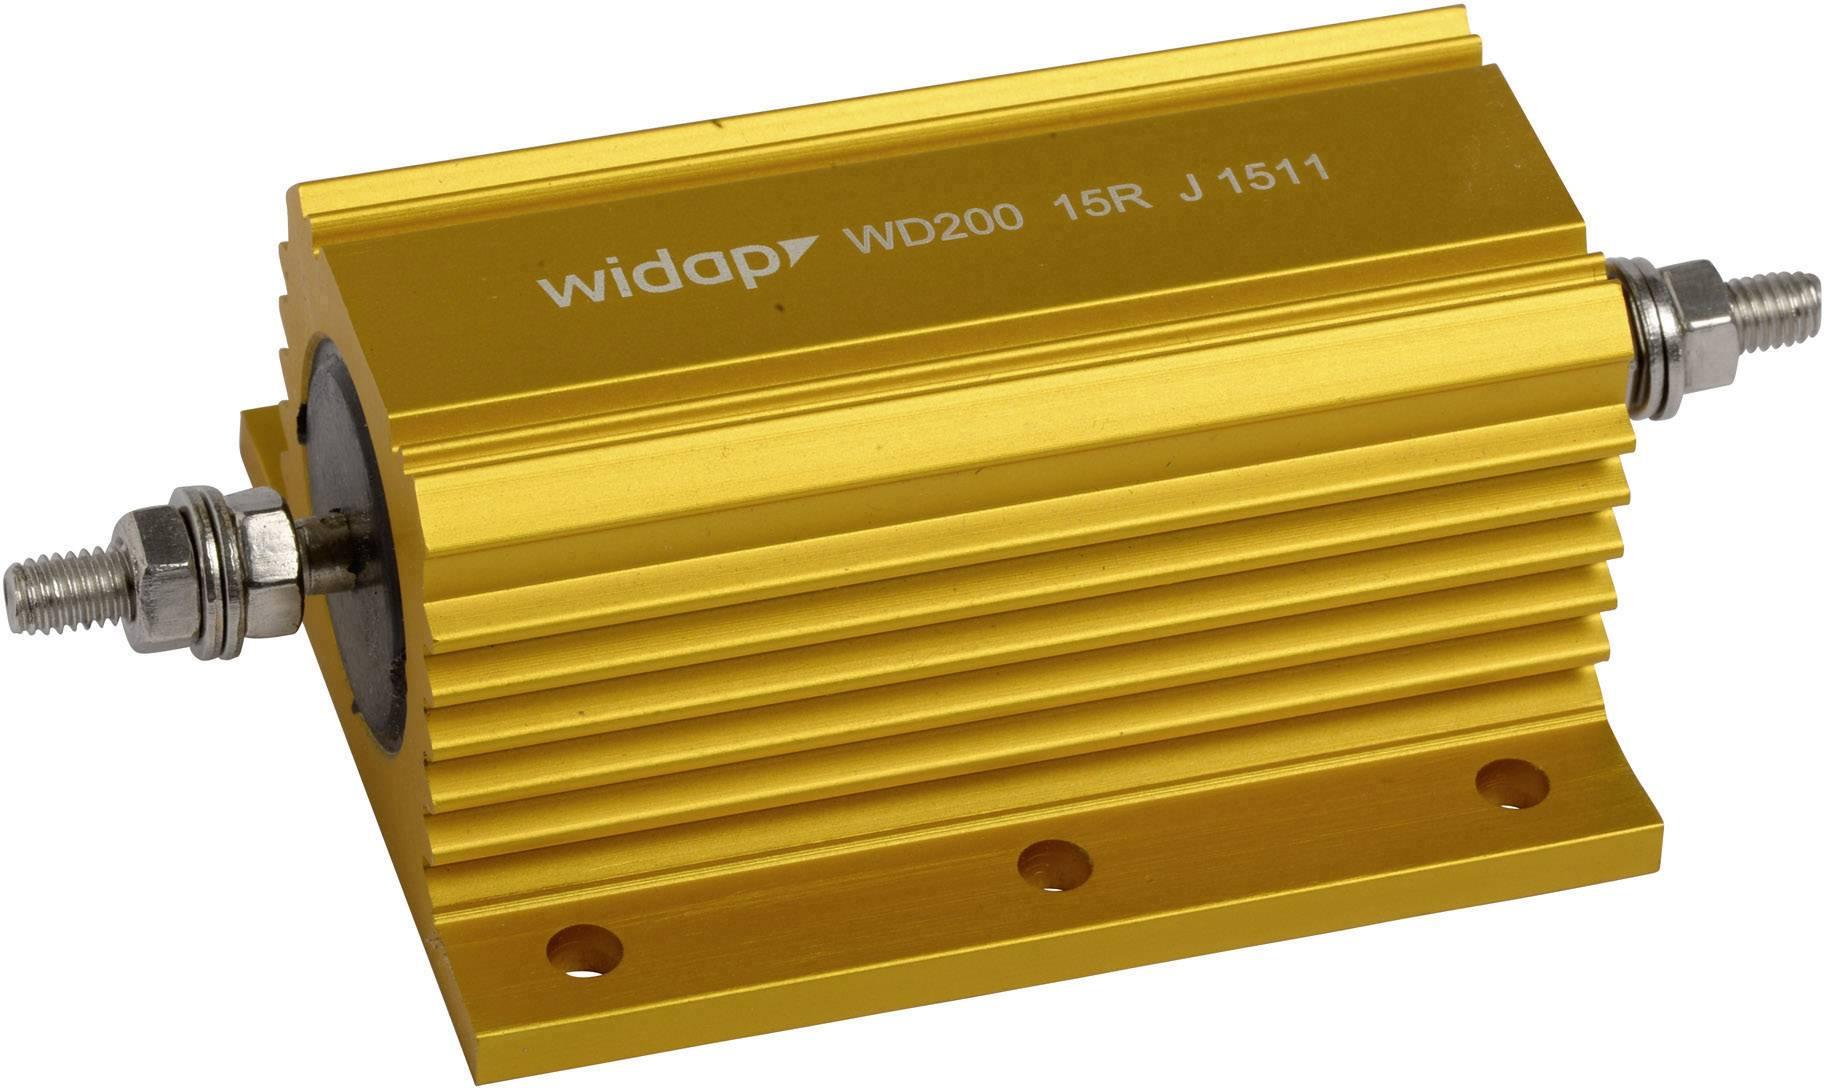 Drôtový rezistor Widap 160154, hodnota odporu 47 Ohm, 200 W, 1 ks